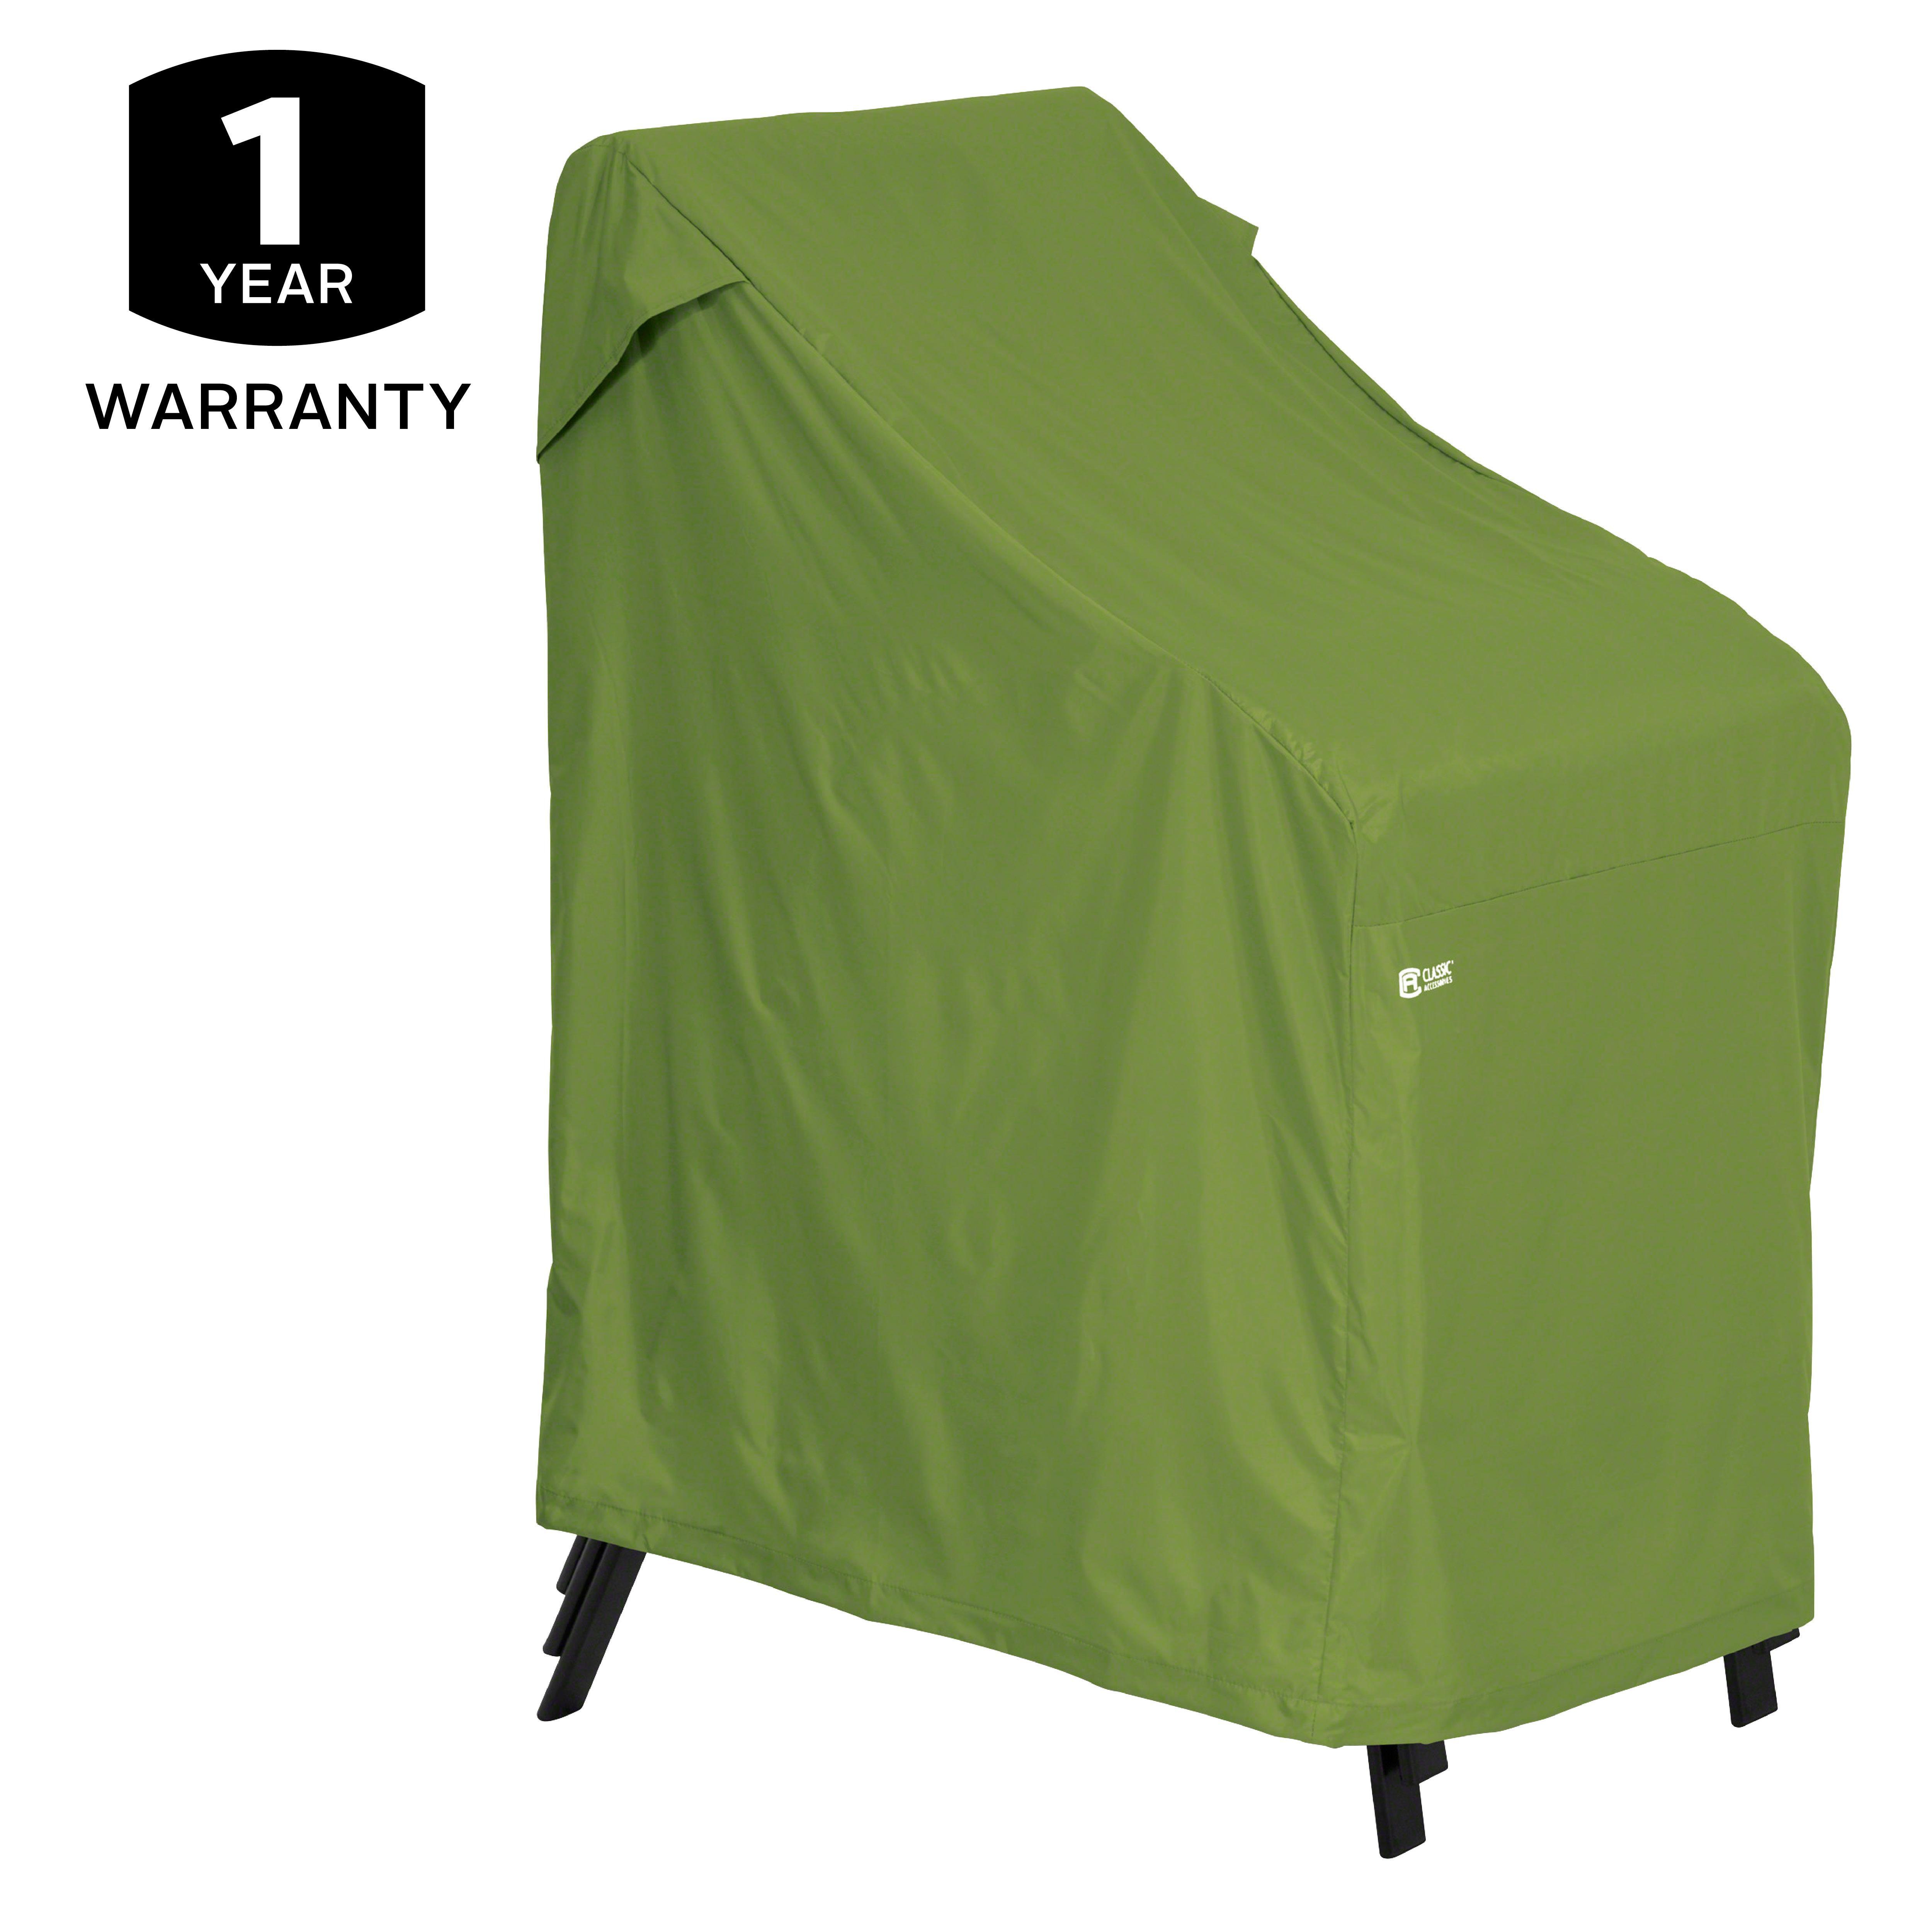 Classic accessories 55 349 011901 ec chair cover amazon for Patio furniture covers amazon ca